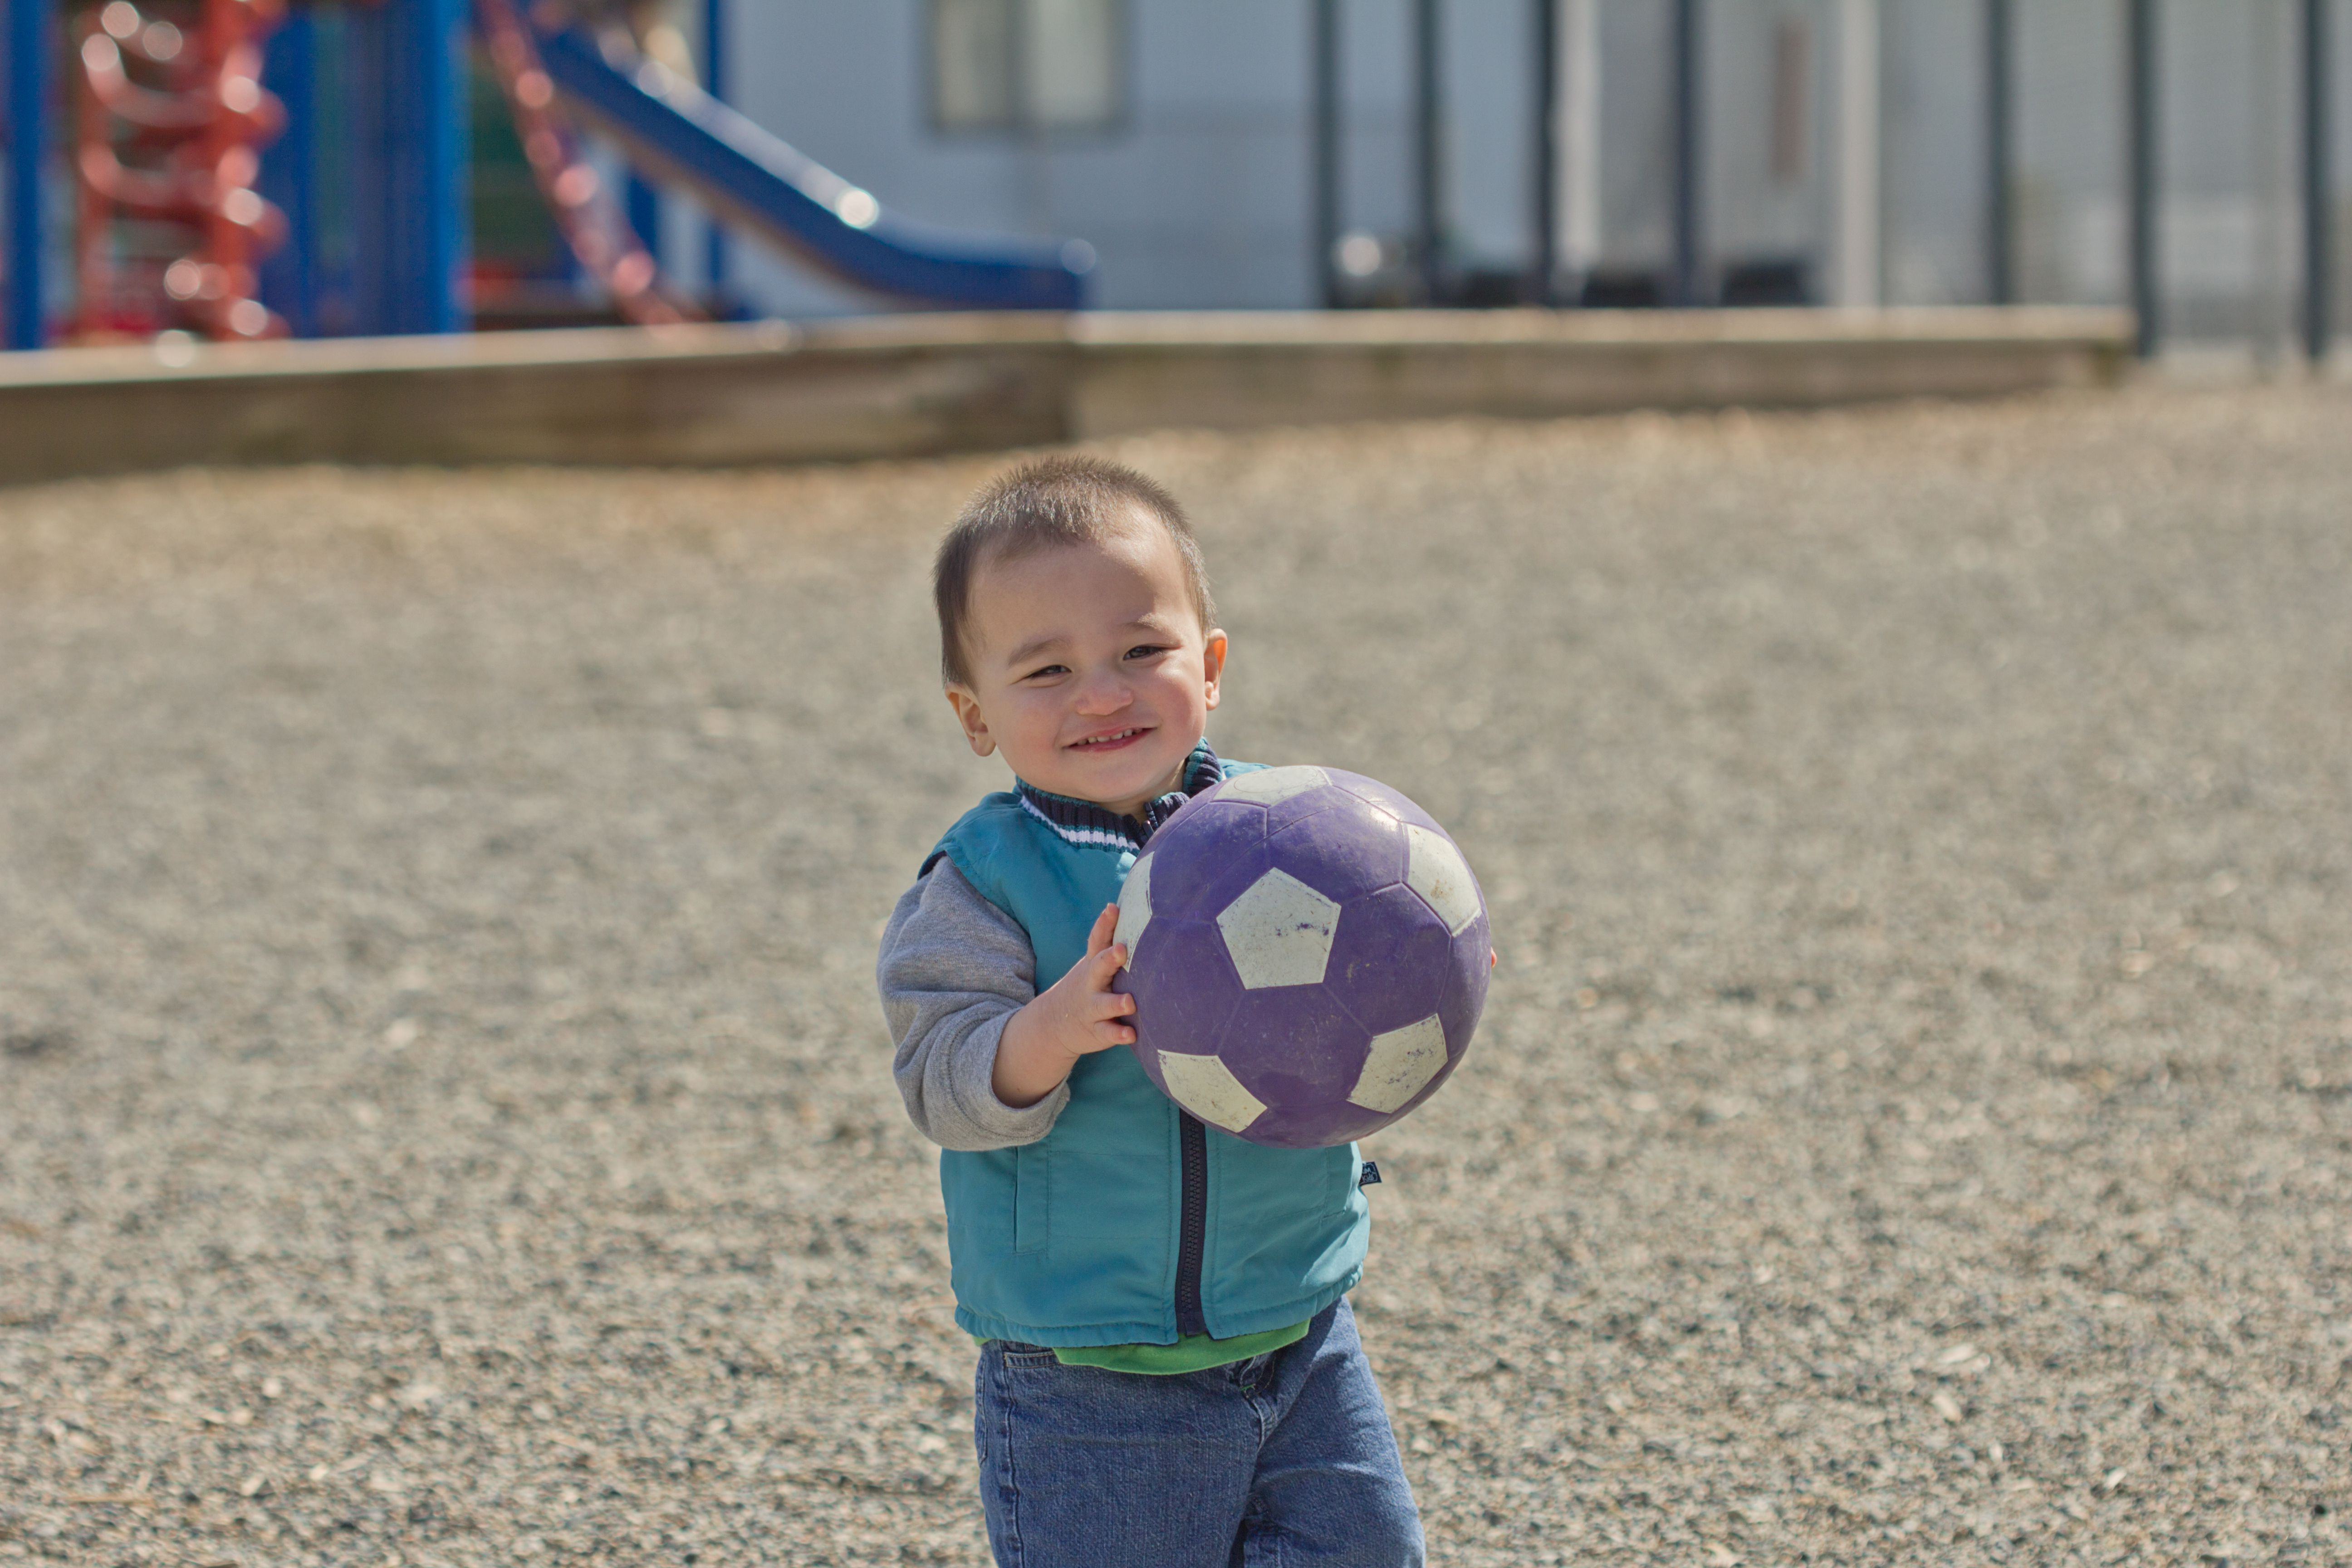 a toddler holding a soccer ball